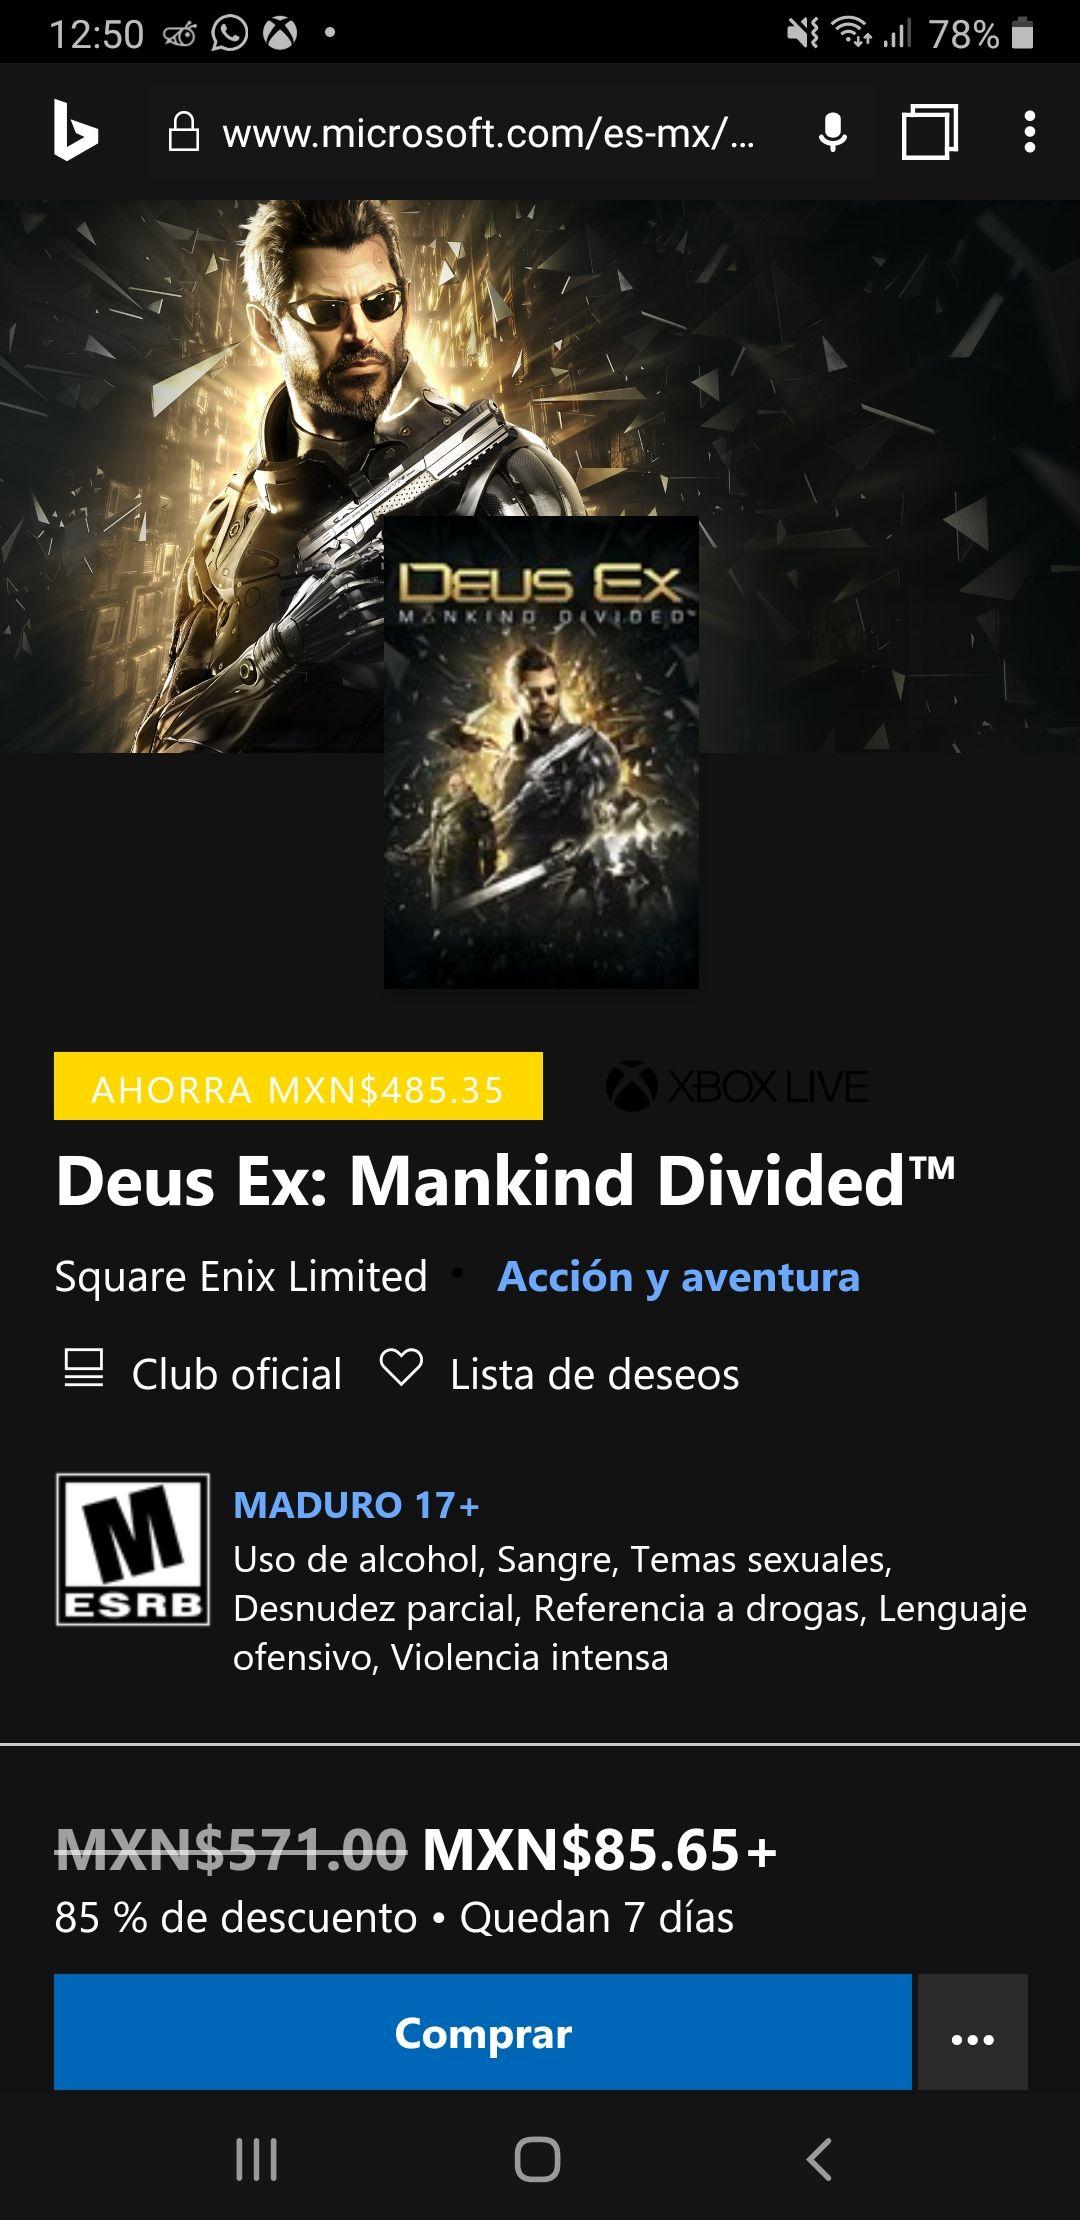 Microsoft Store: Deus Ex Mankind Divided